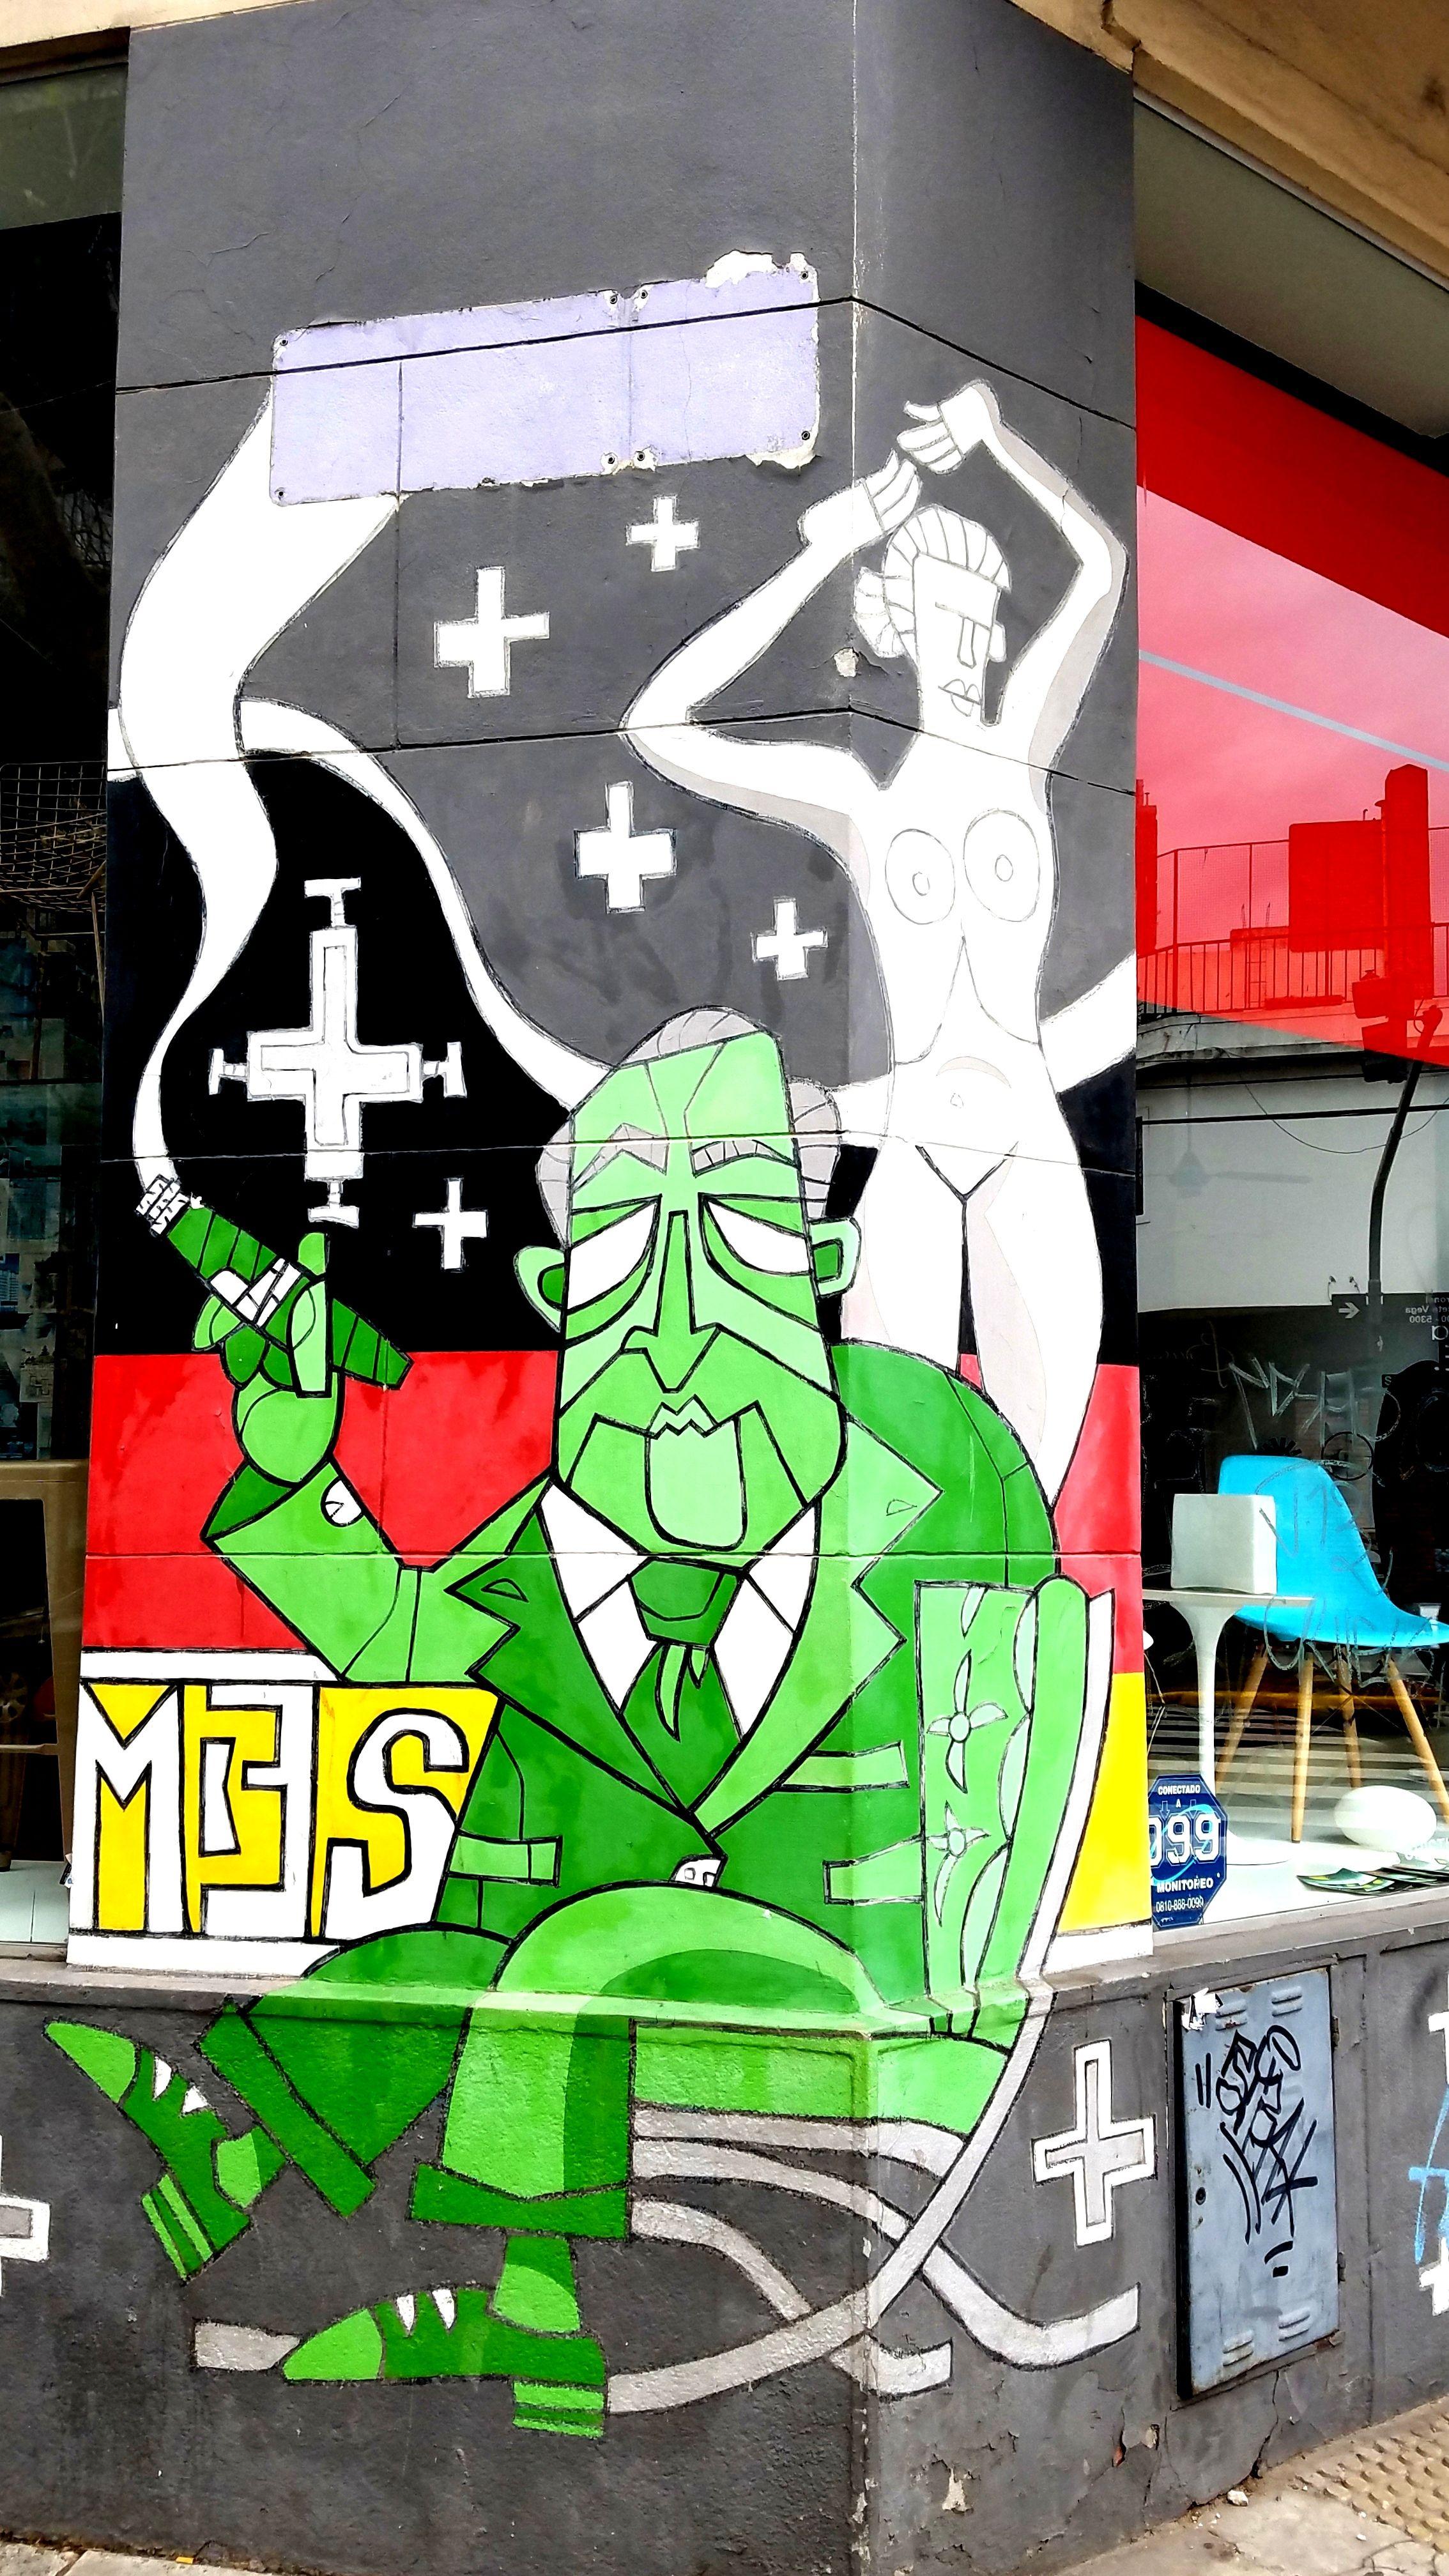 Buenos Aires Argentina Street Art Graffiti Designer Corner With Mies Van Der